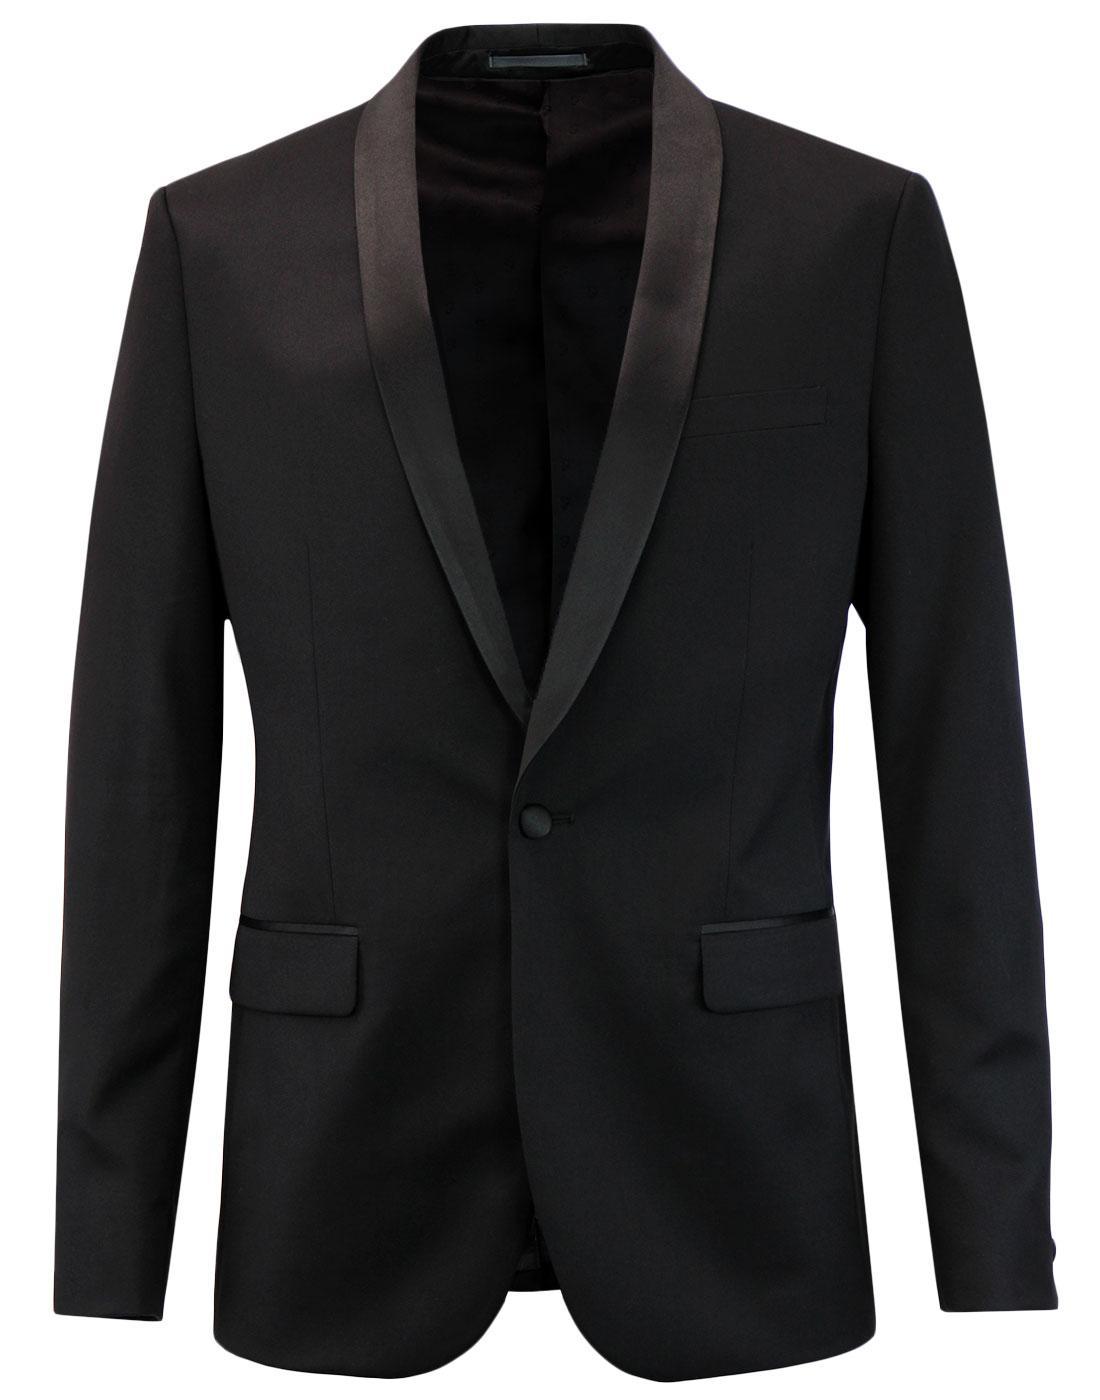 FARAH Retro 1960s Shawl Collar Dinner Suit Jacket